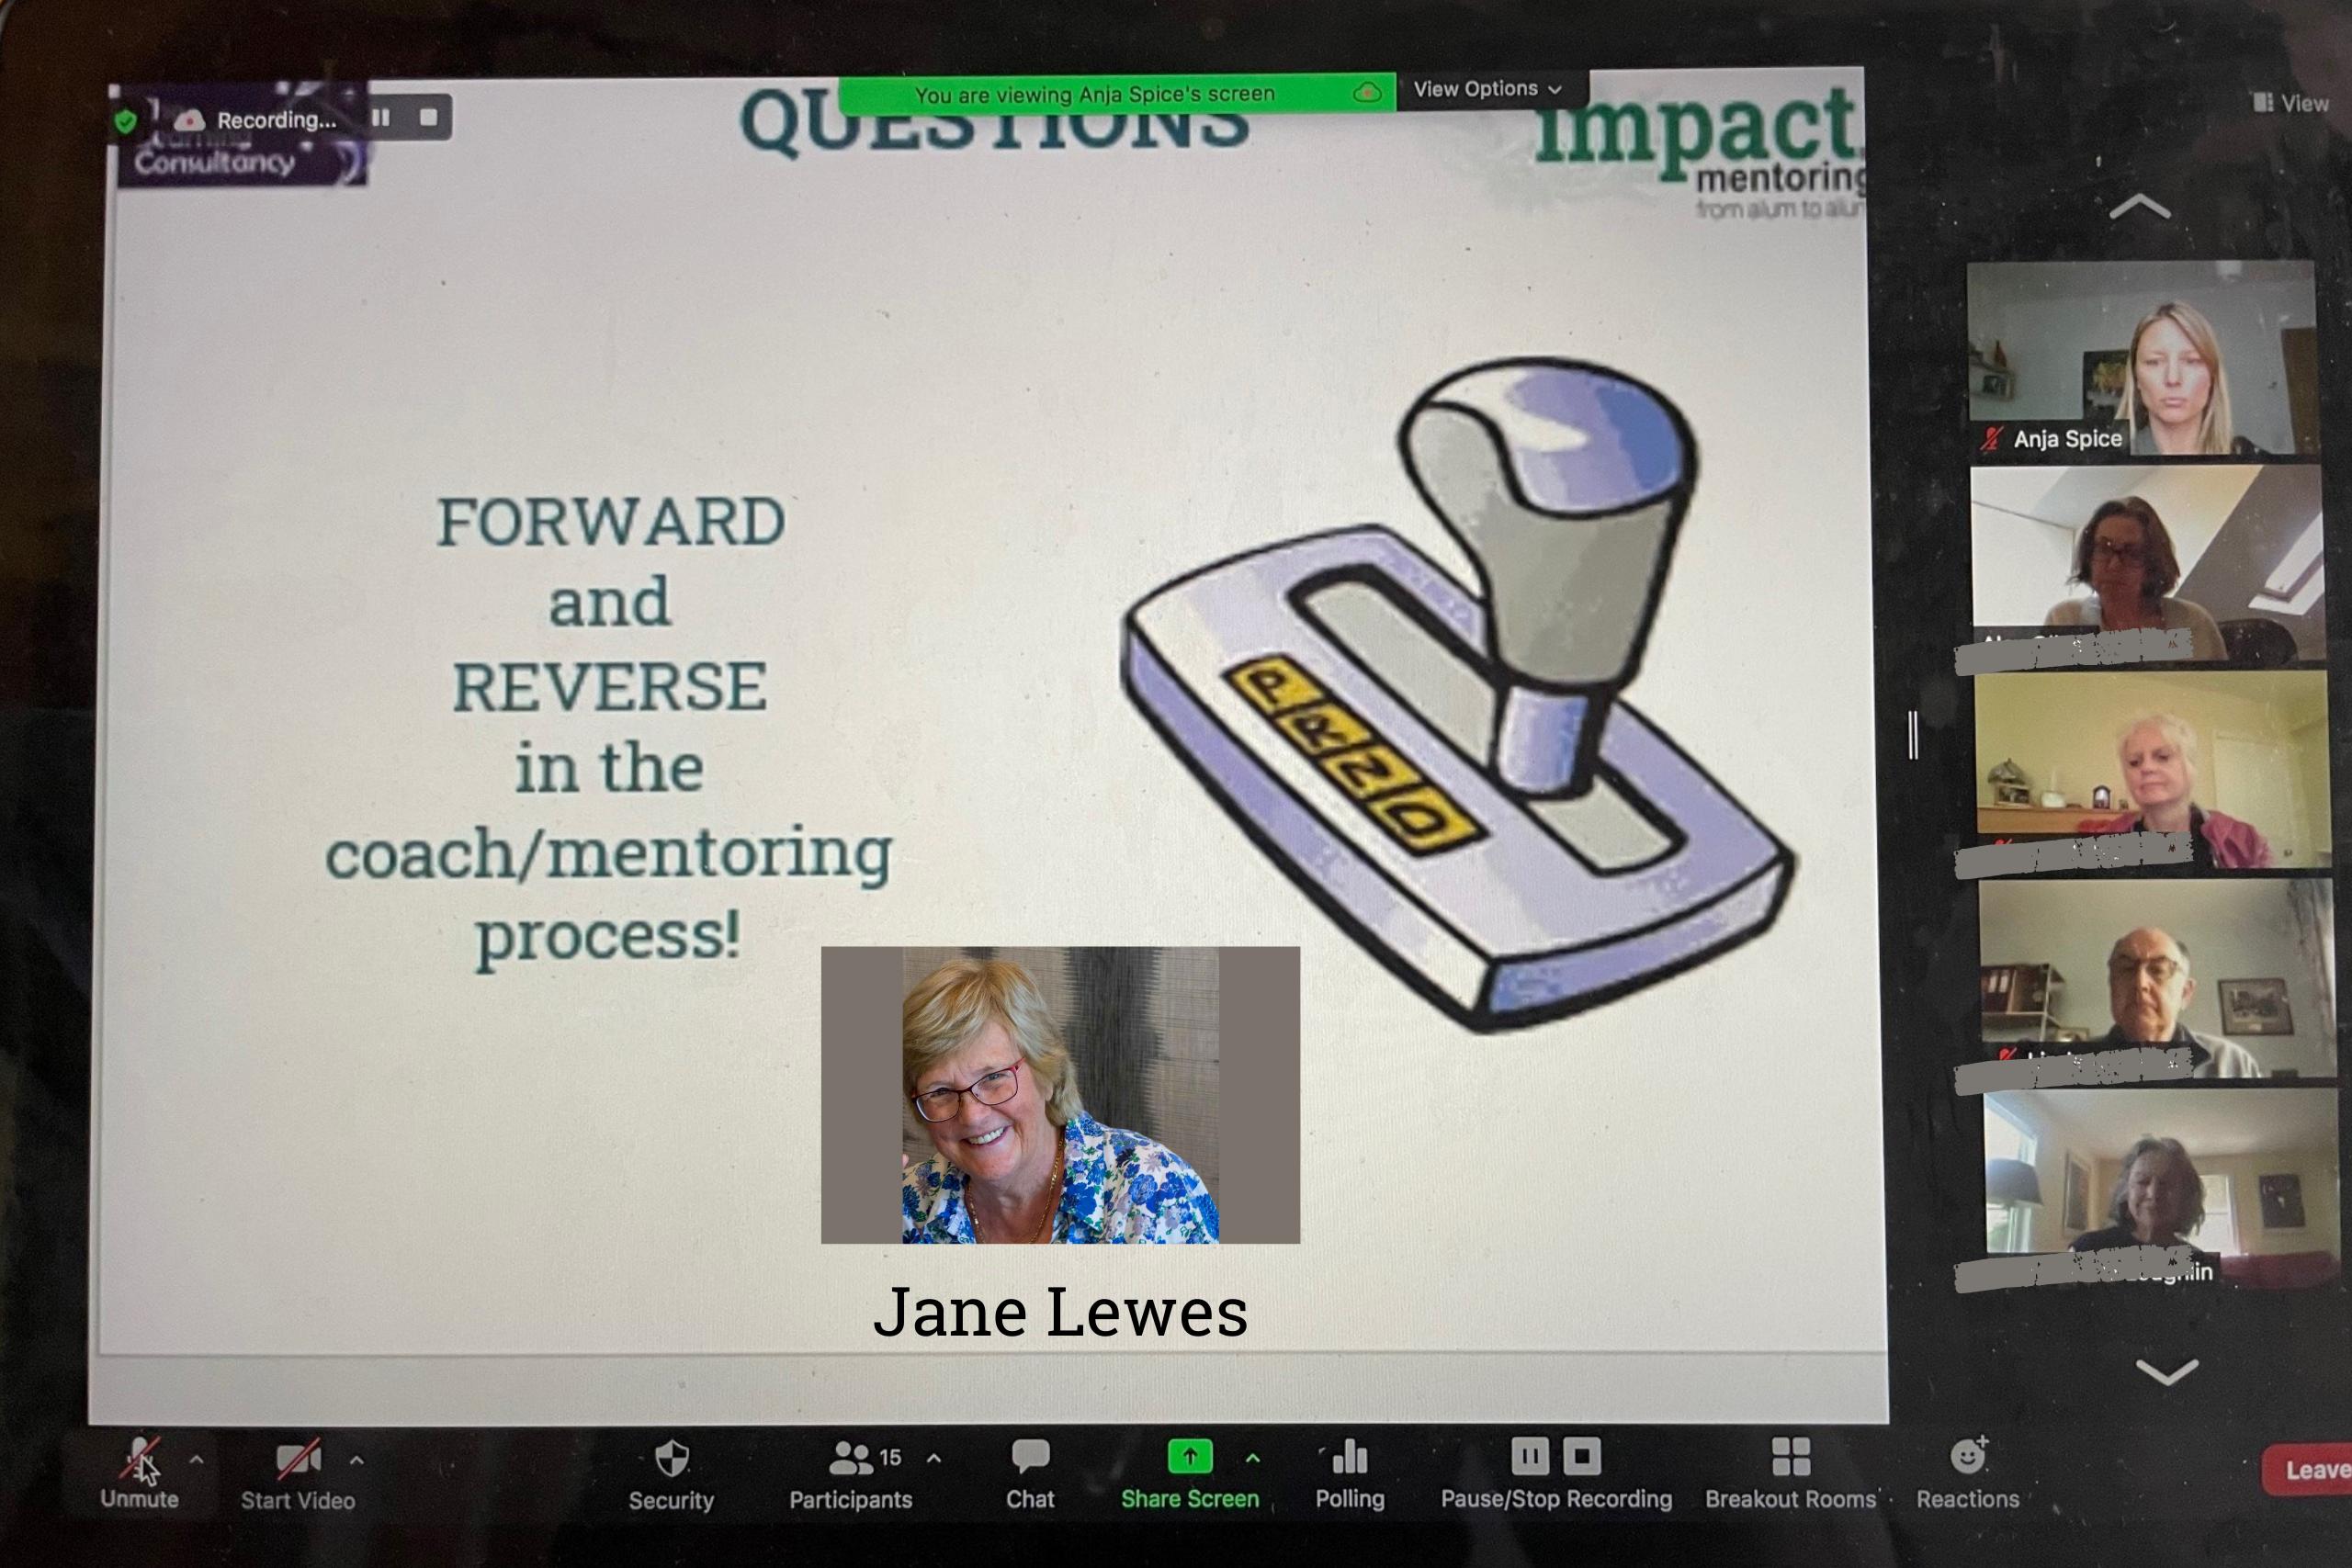 Jane Lewes Mentor event